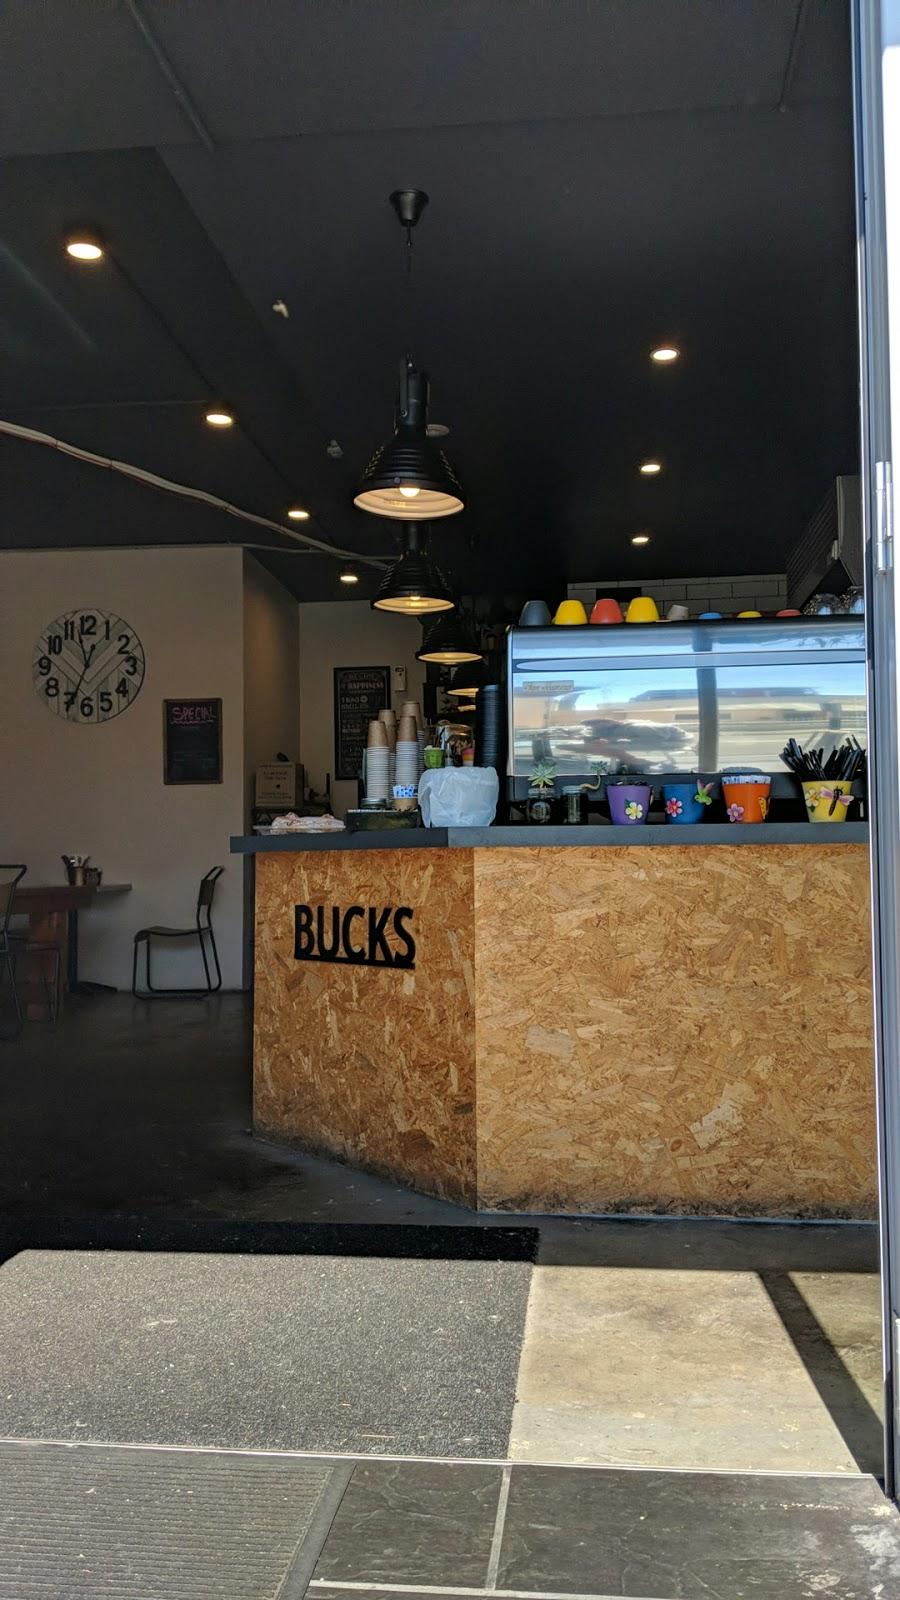 Bucks Cafe | cafe | 11 Stewart St, Wollongong NSW 2500, Australia | 0413051274 OR +61 413 051 274